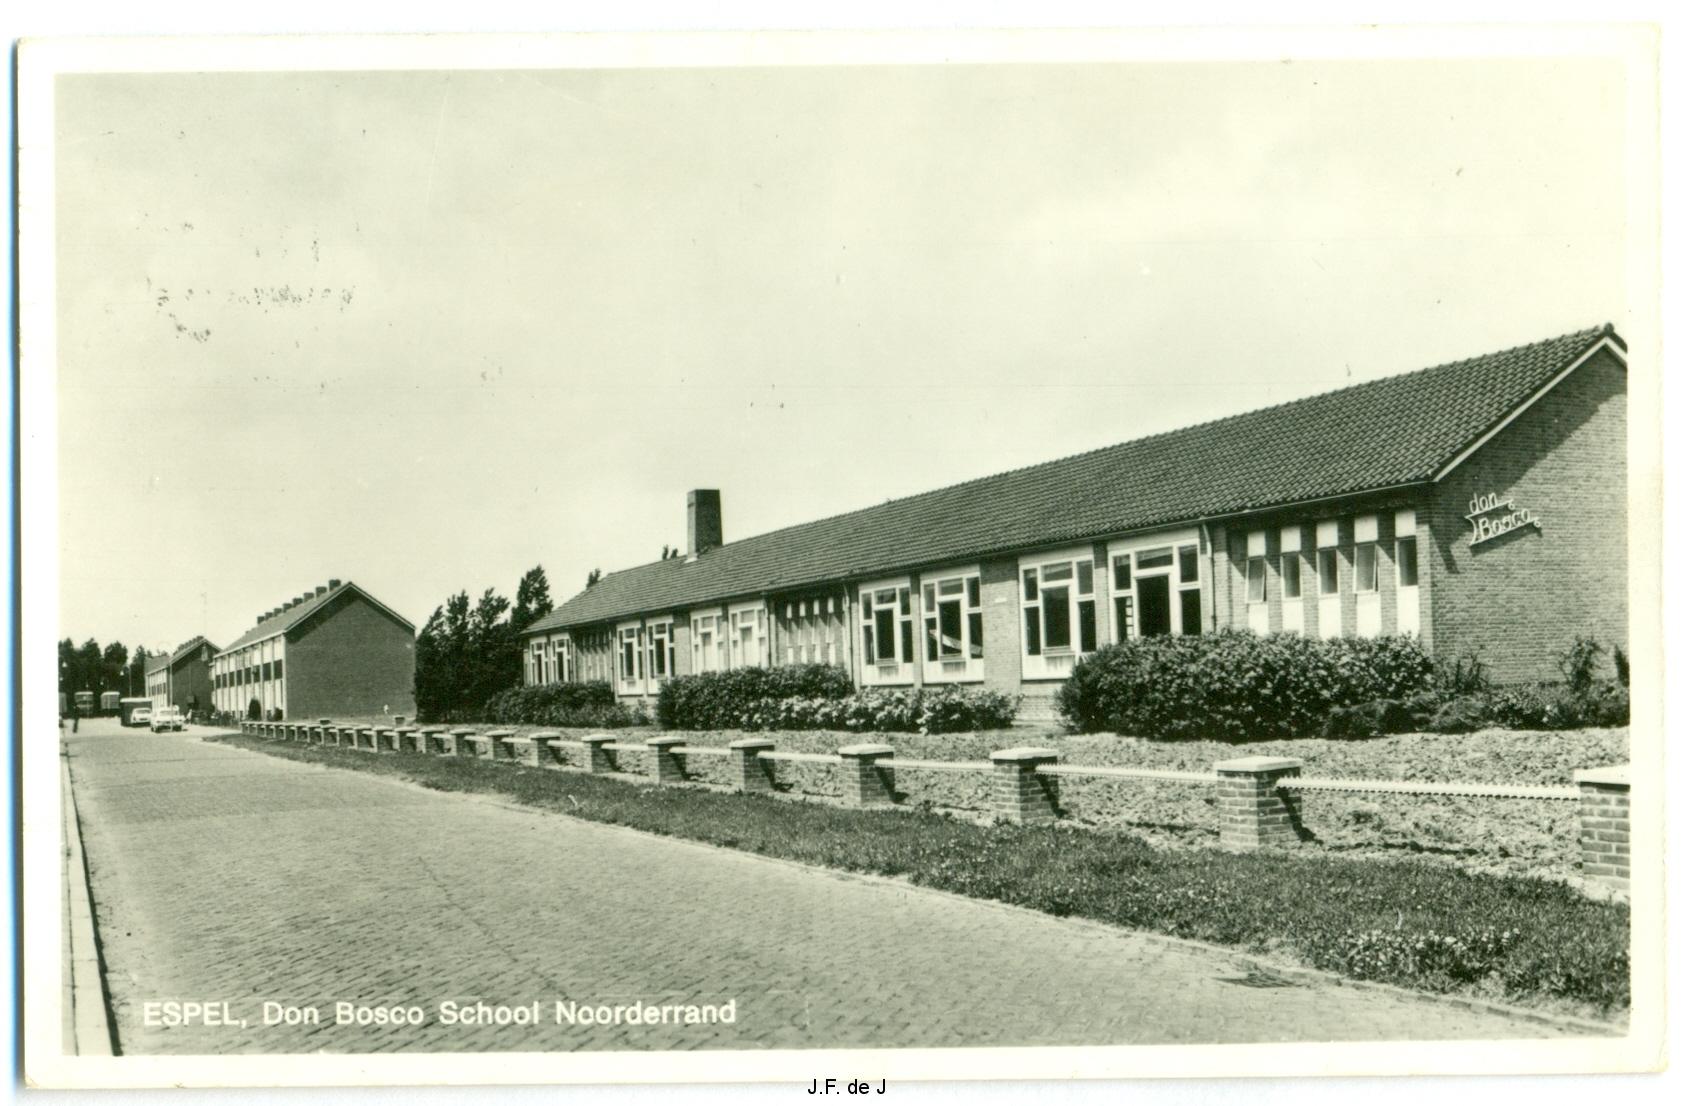 School Noorderrand Emmeloord